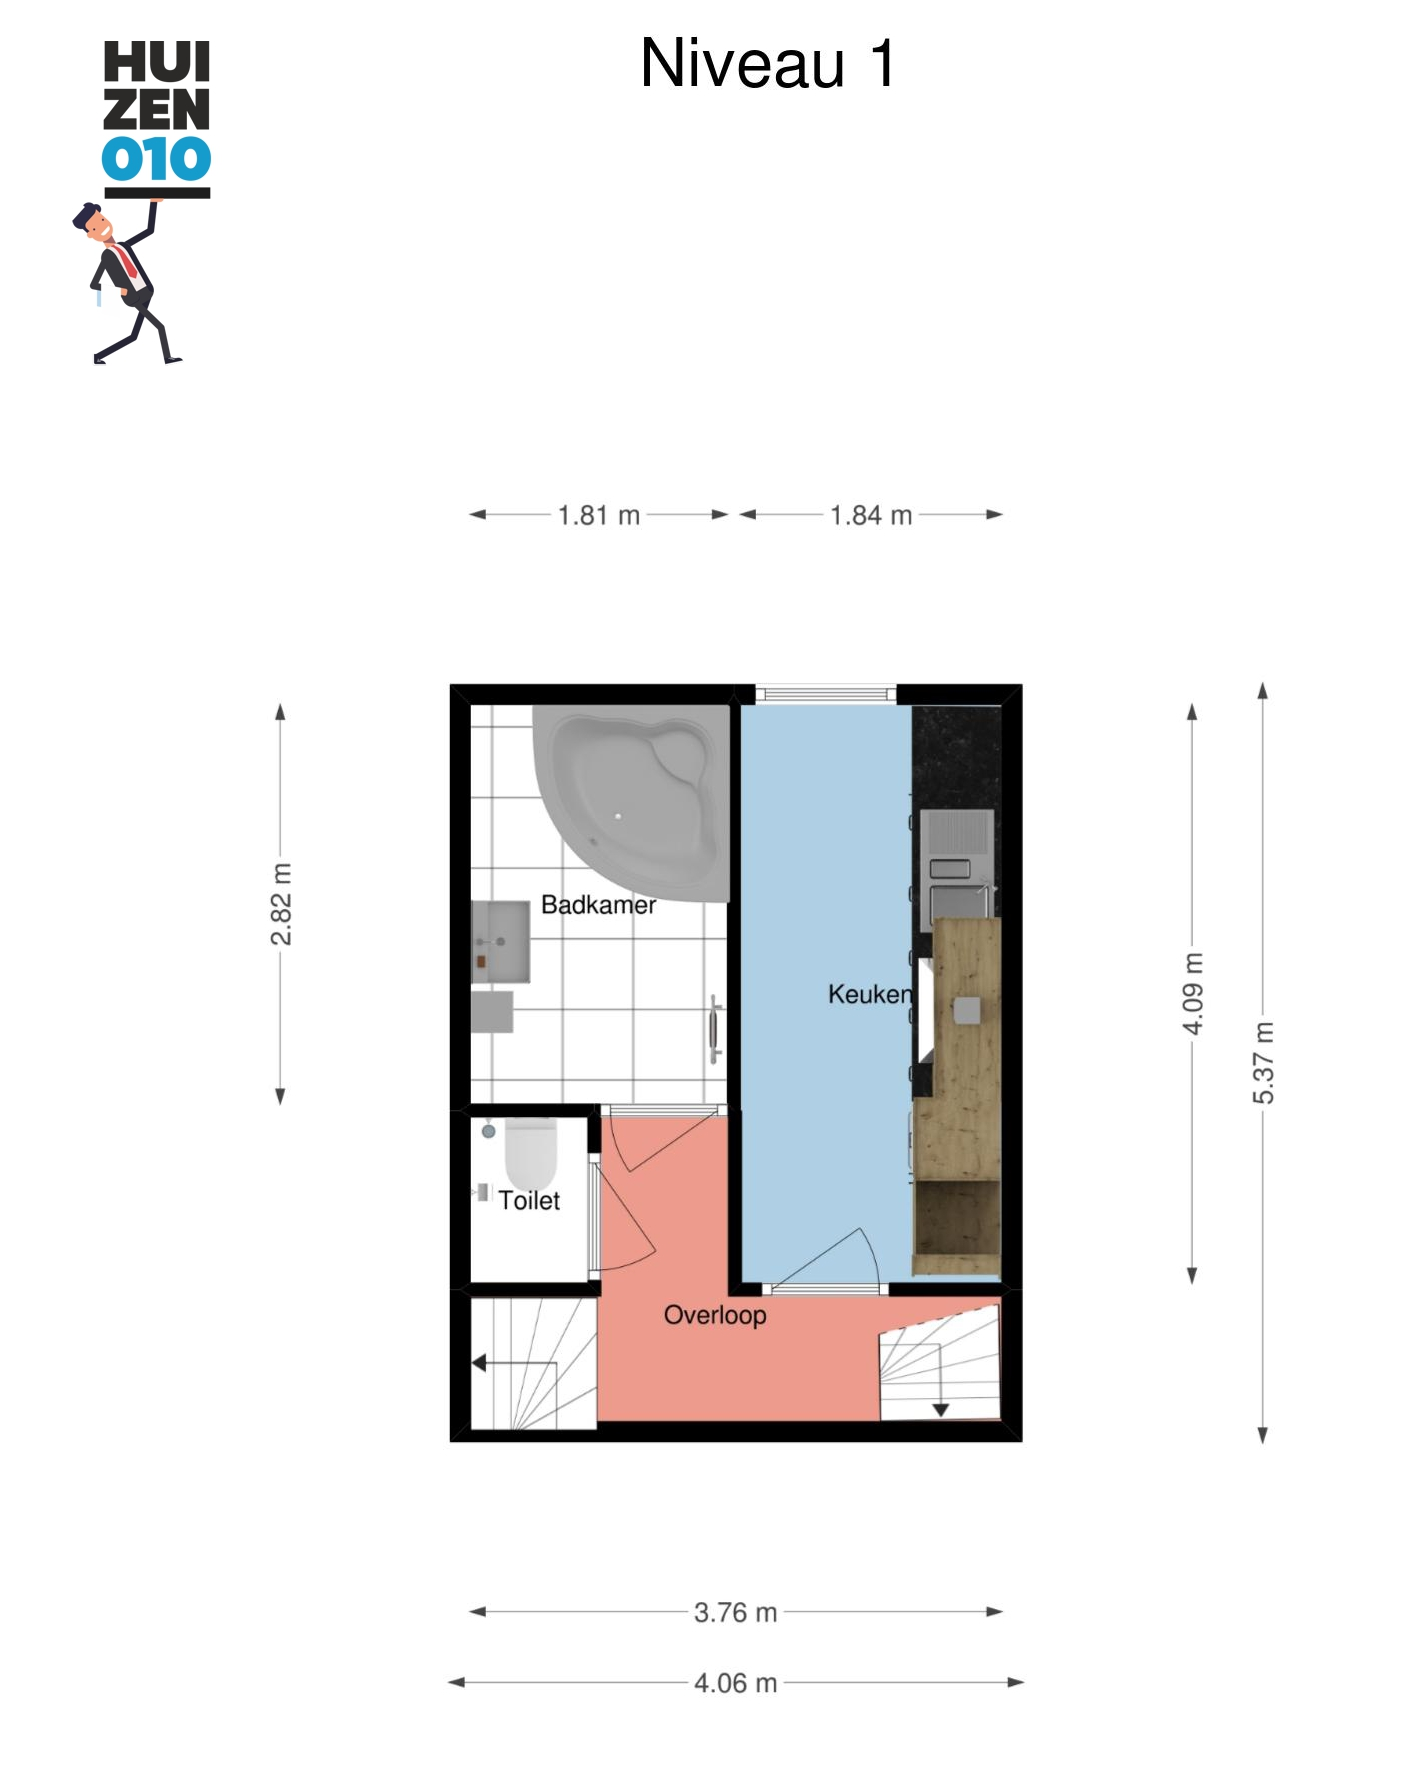 Plattegrond Frederikstraat 77 Rotterdam HUIZEN010